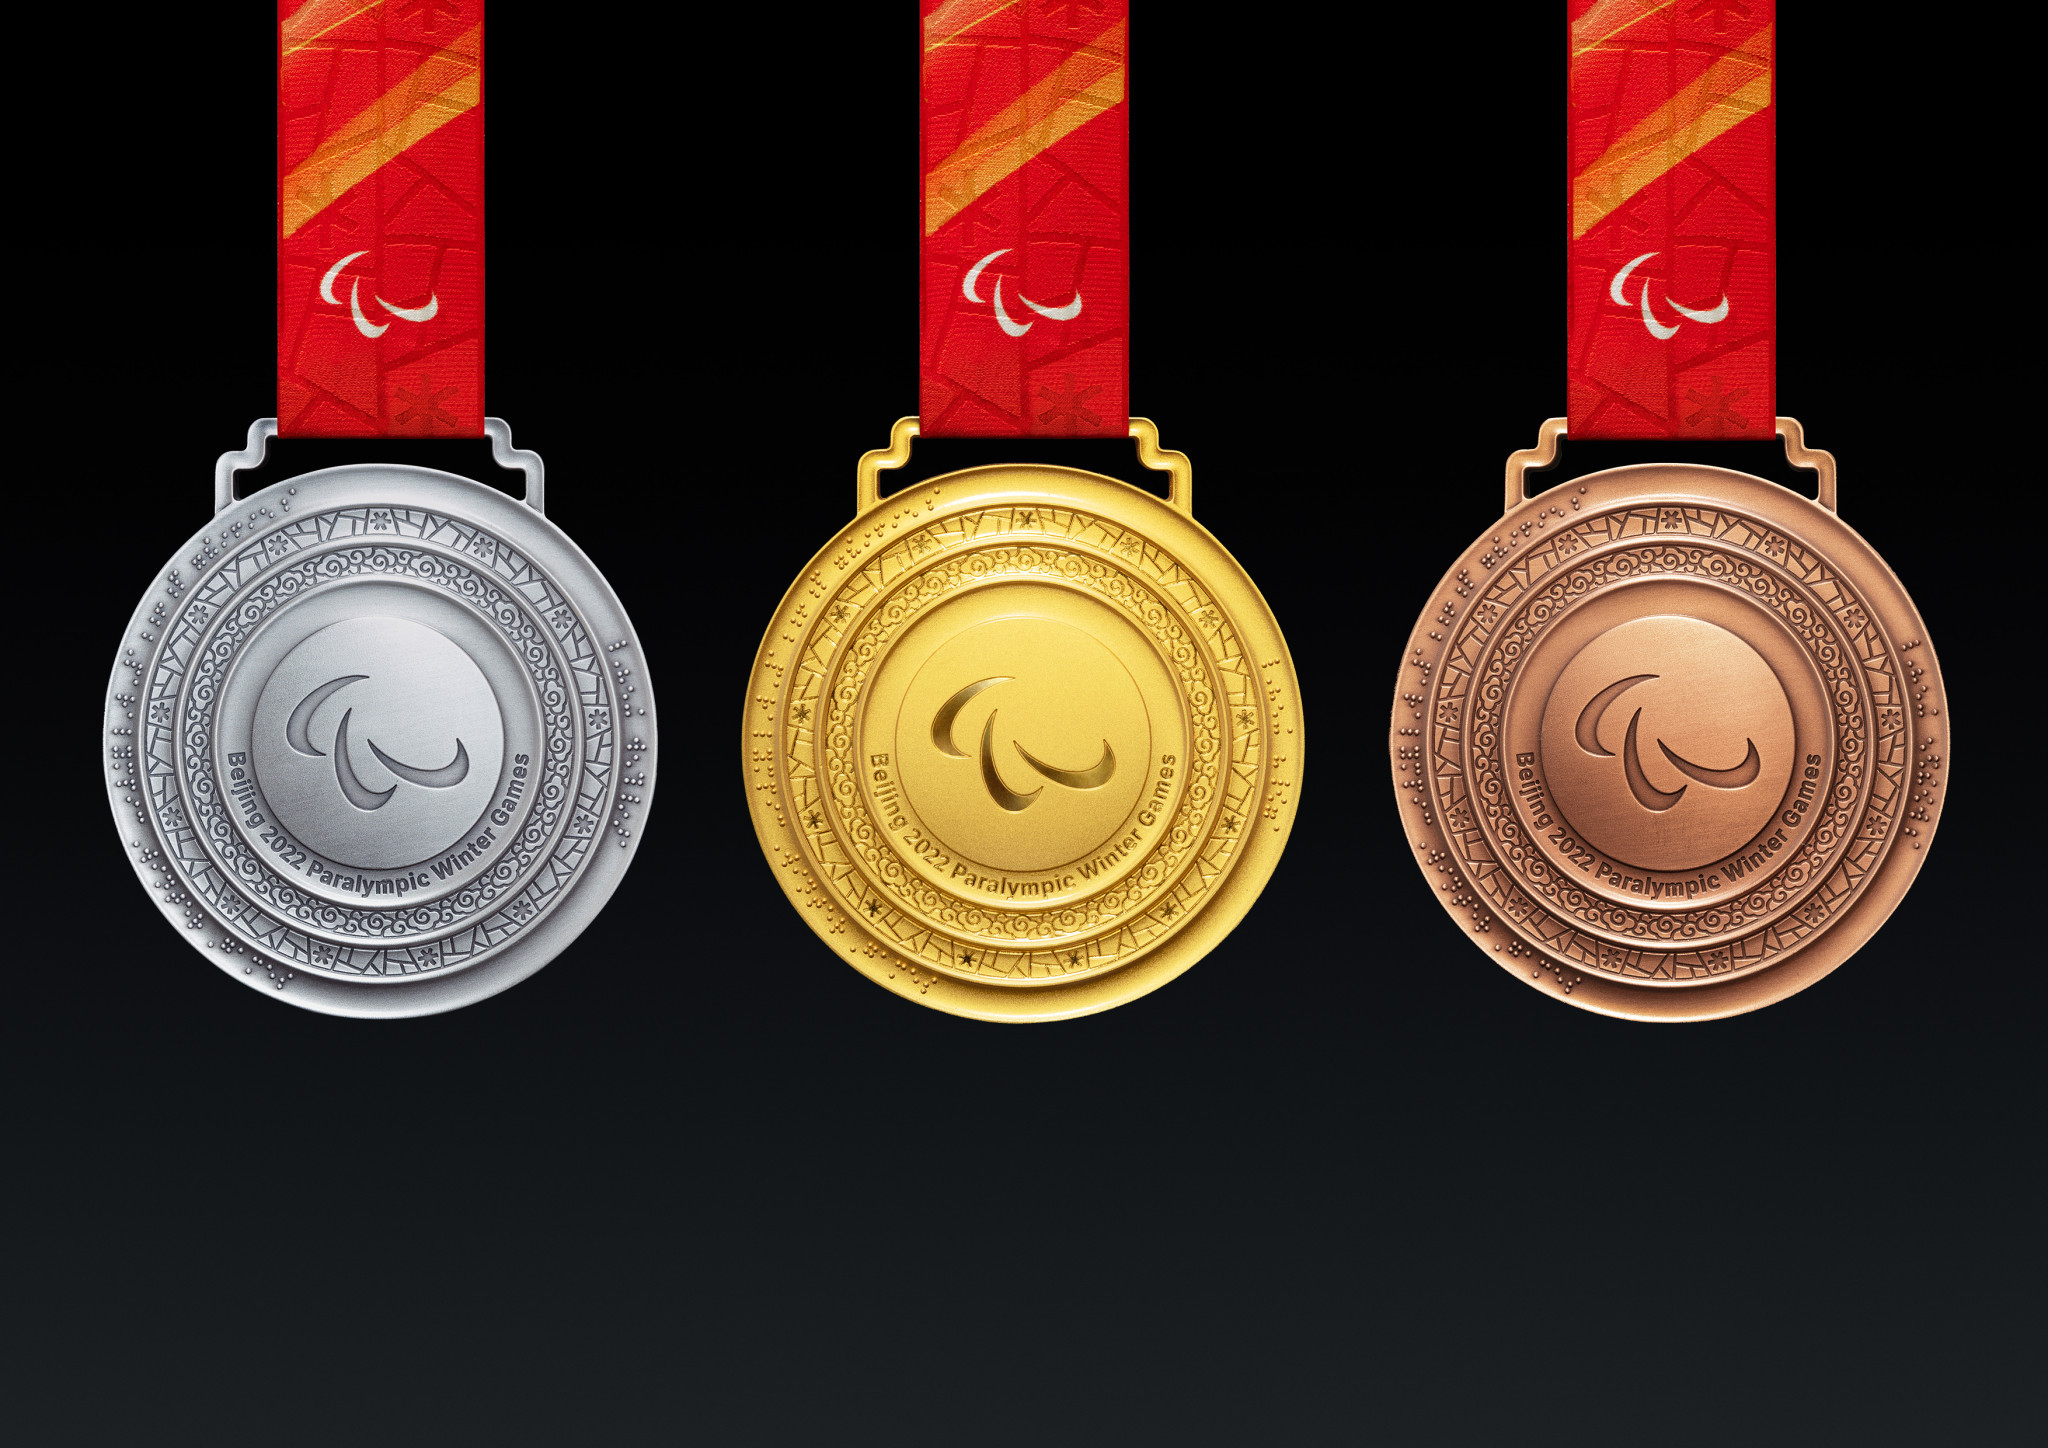 Beijing 2022 celebrates hosting Summer and Winter Olympics in medal design